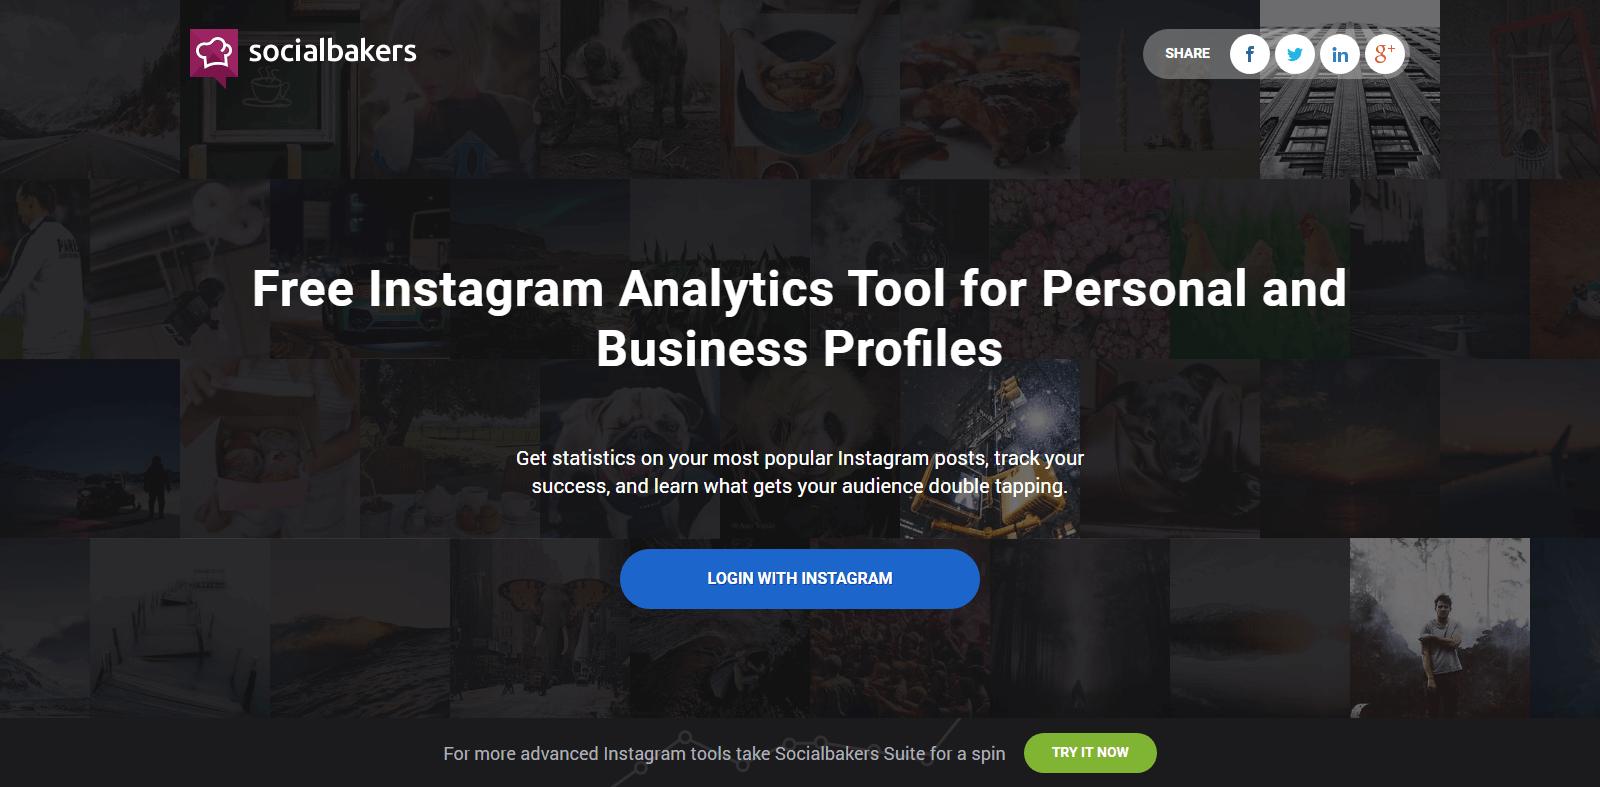 Socialbakers Instagram Analytics Tools